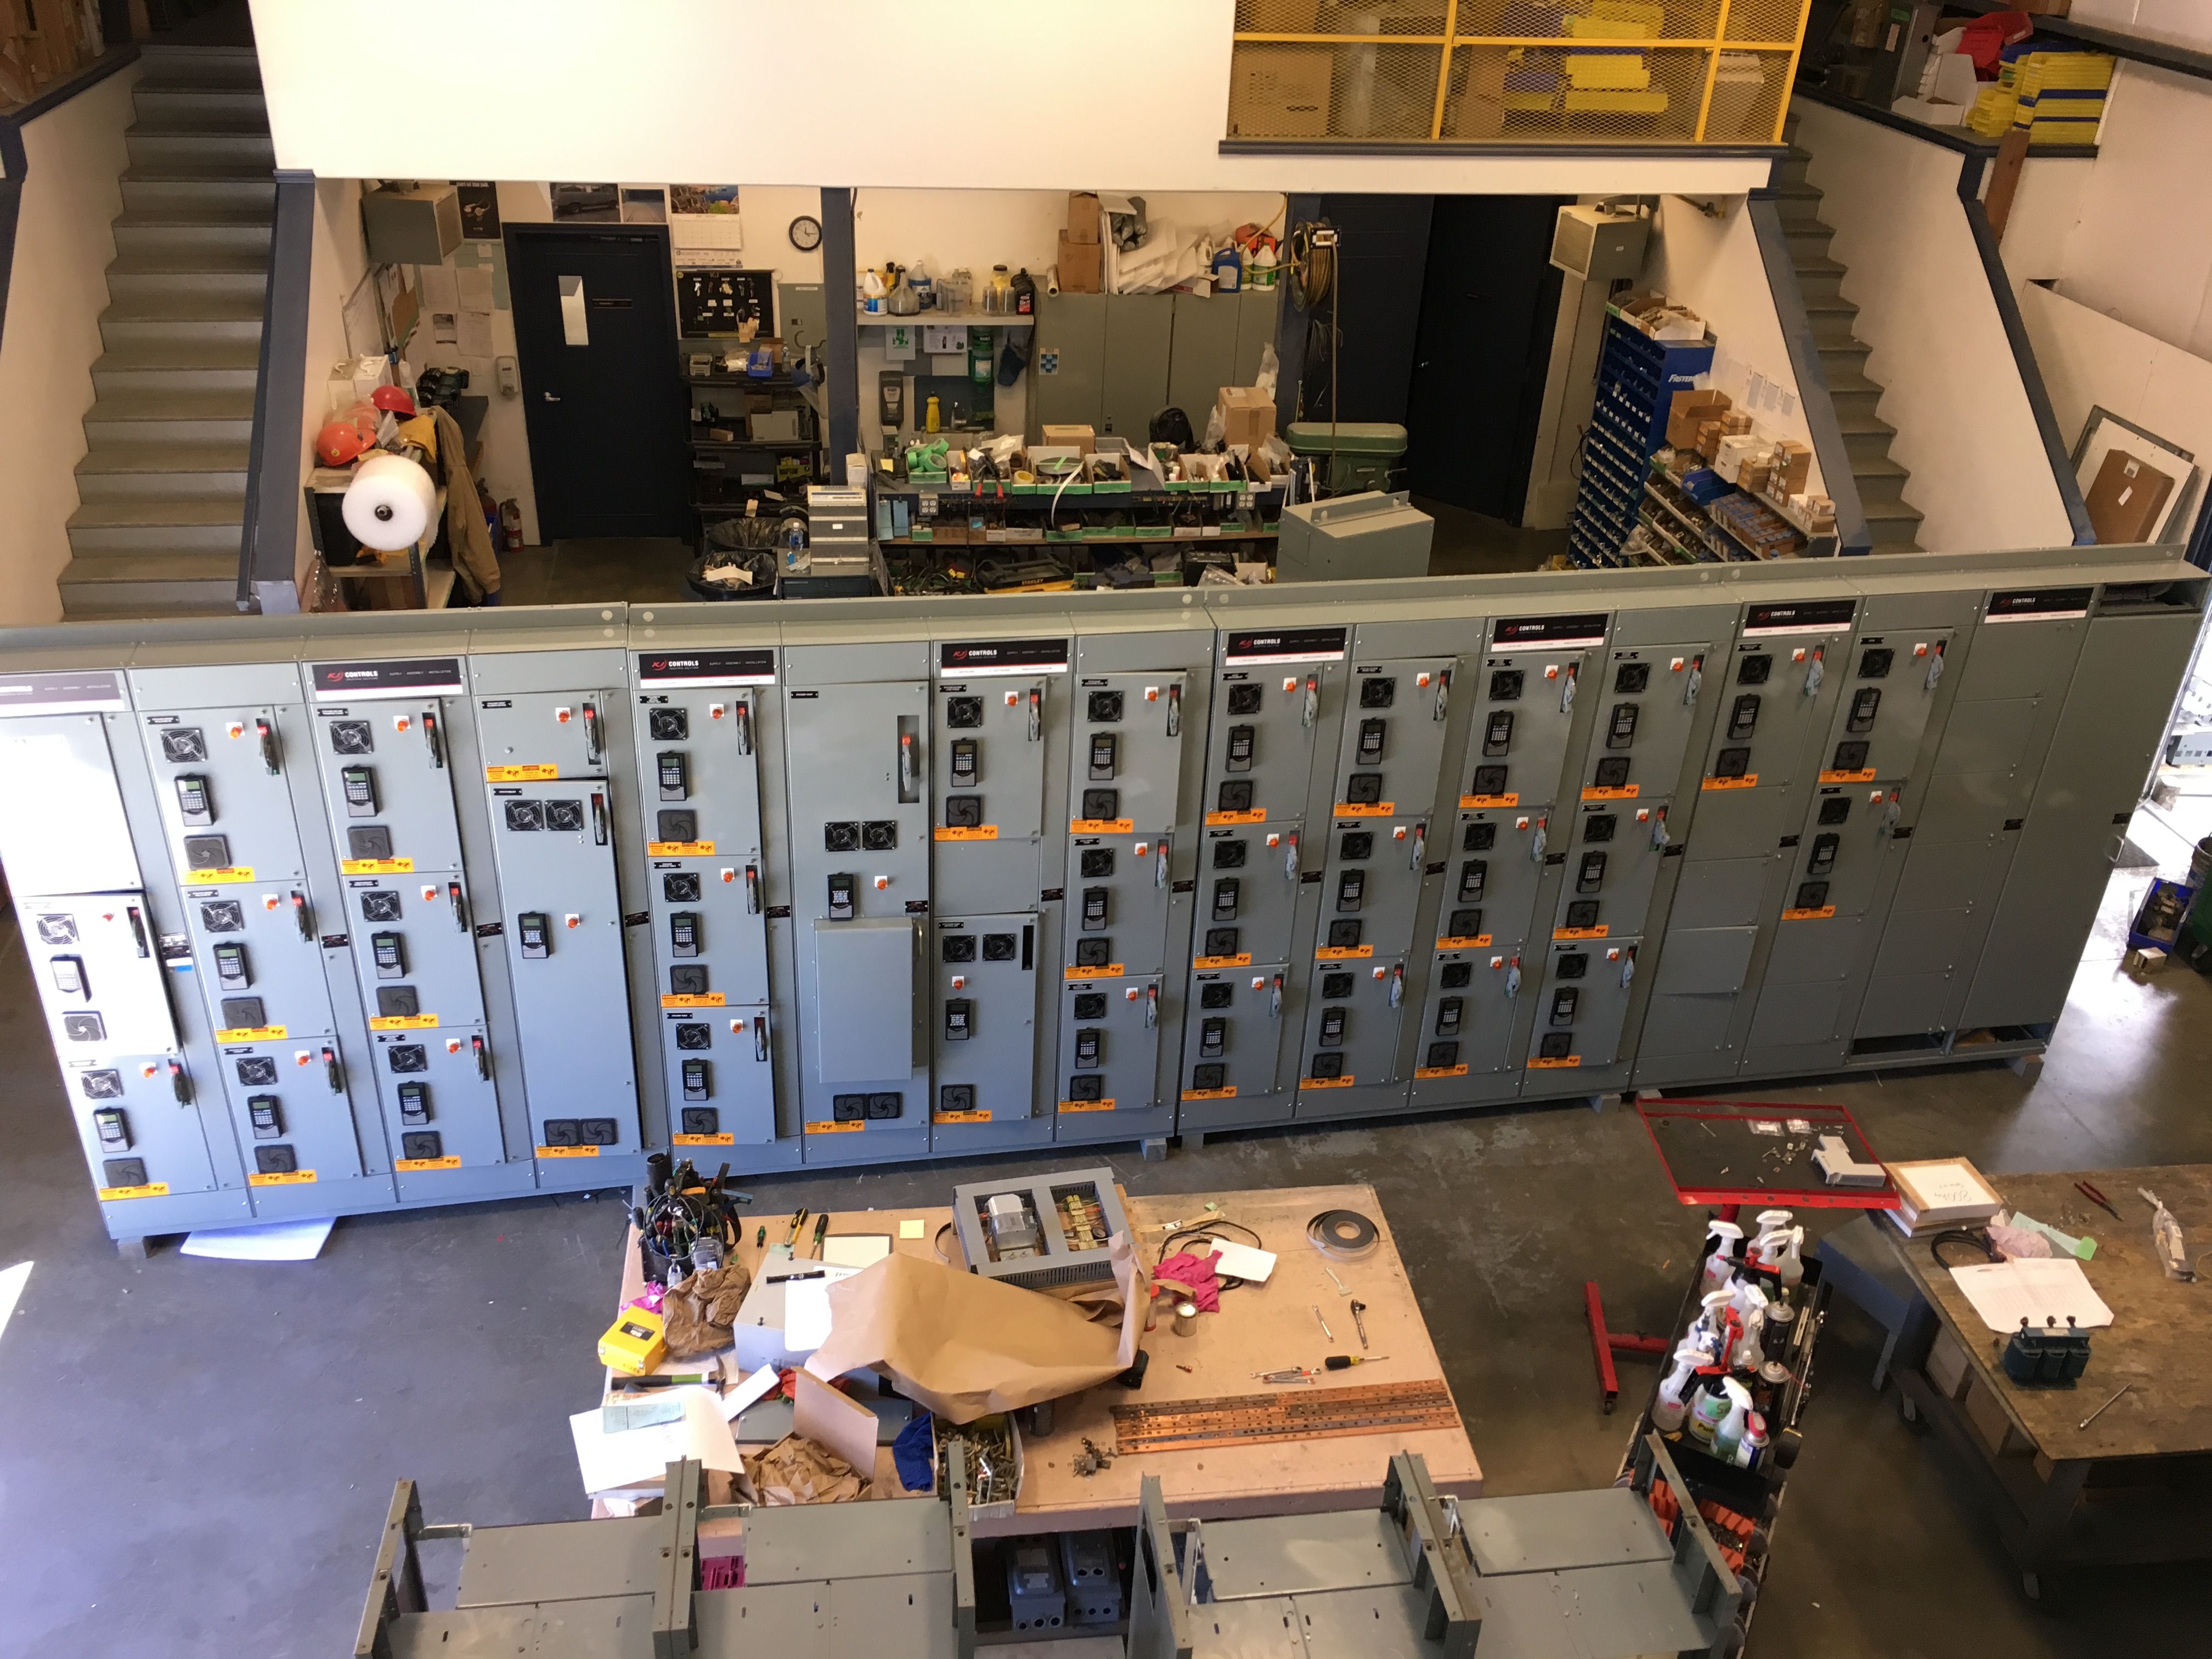 powerflex 525 wiring diagram 16 section mcc supply kj contracting  16 section mcc supply kj contracting